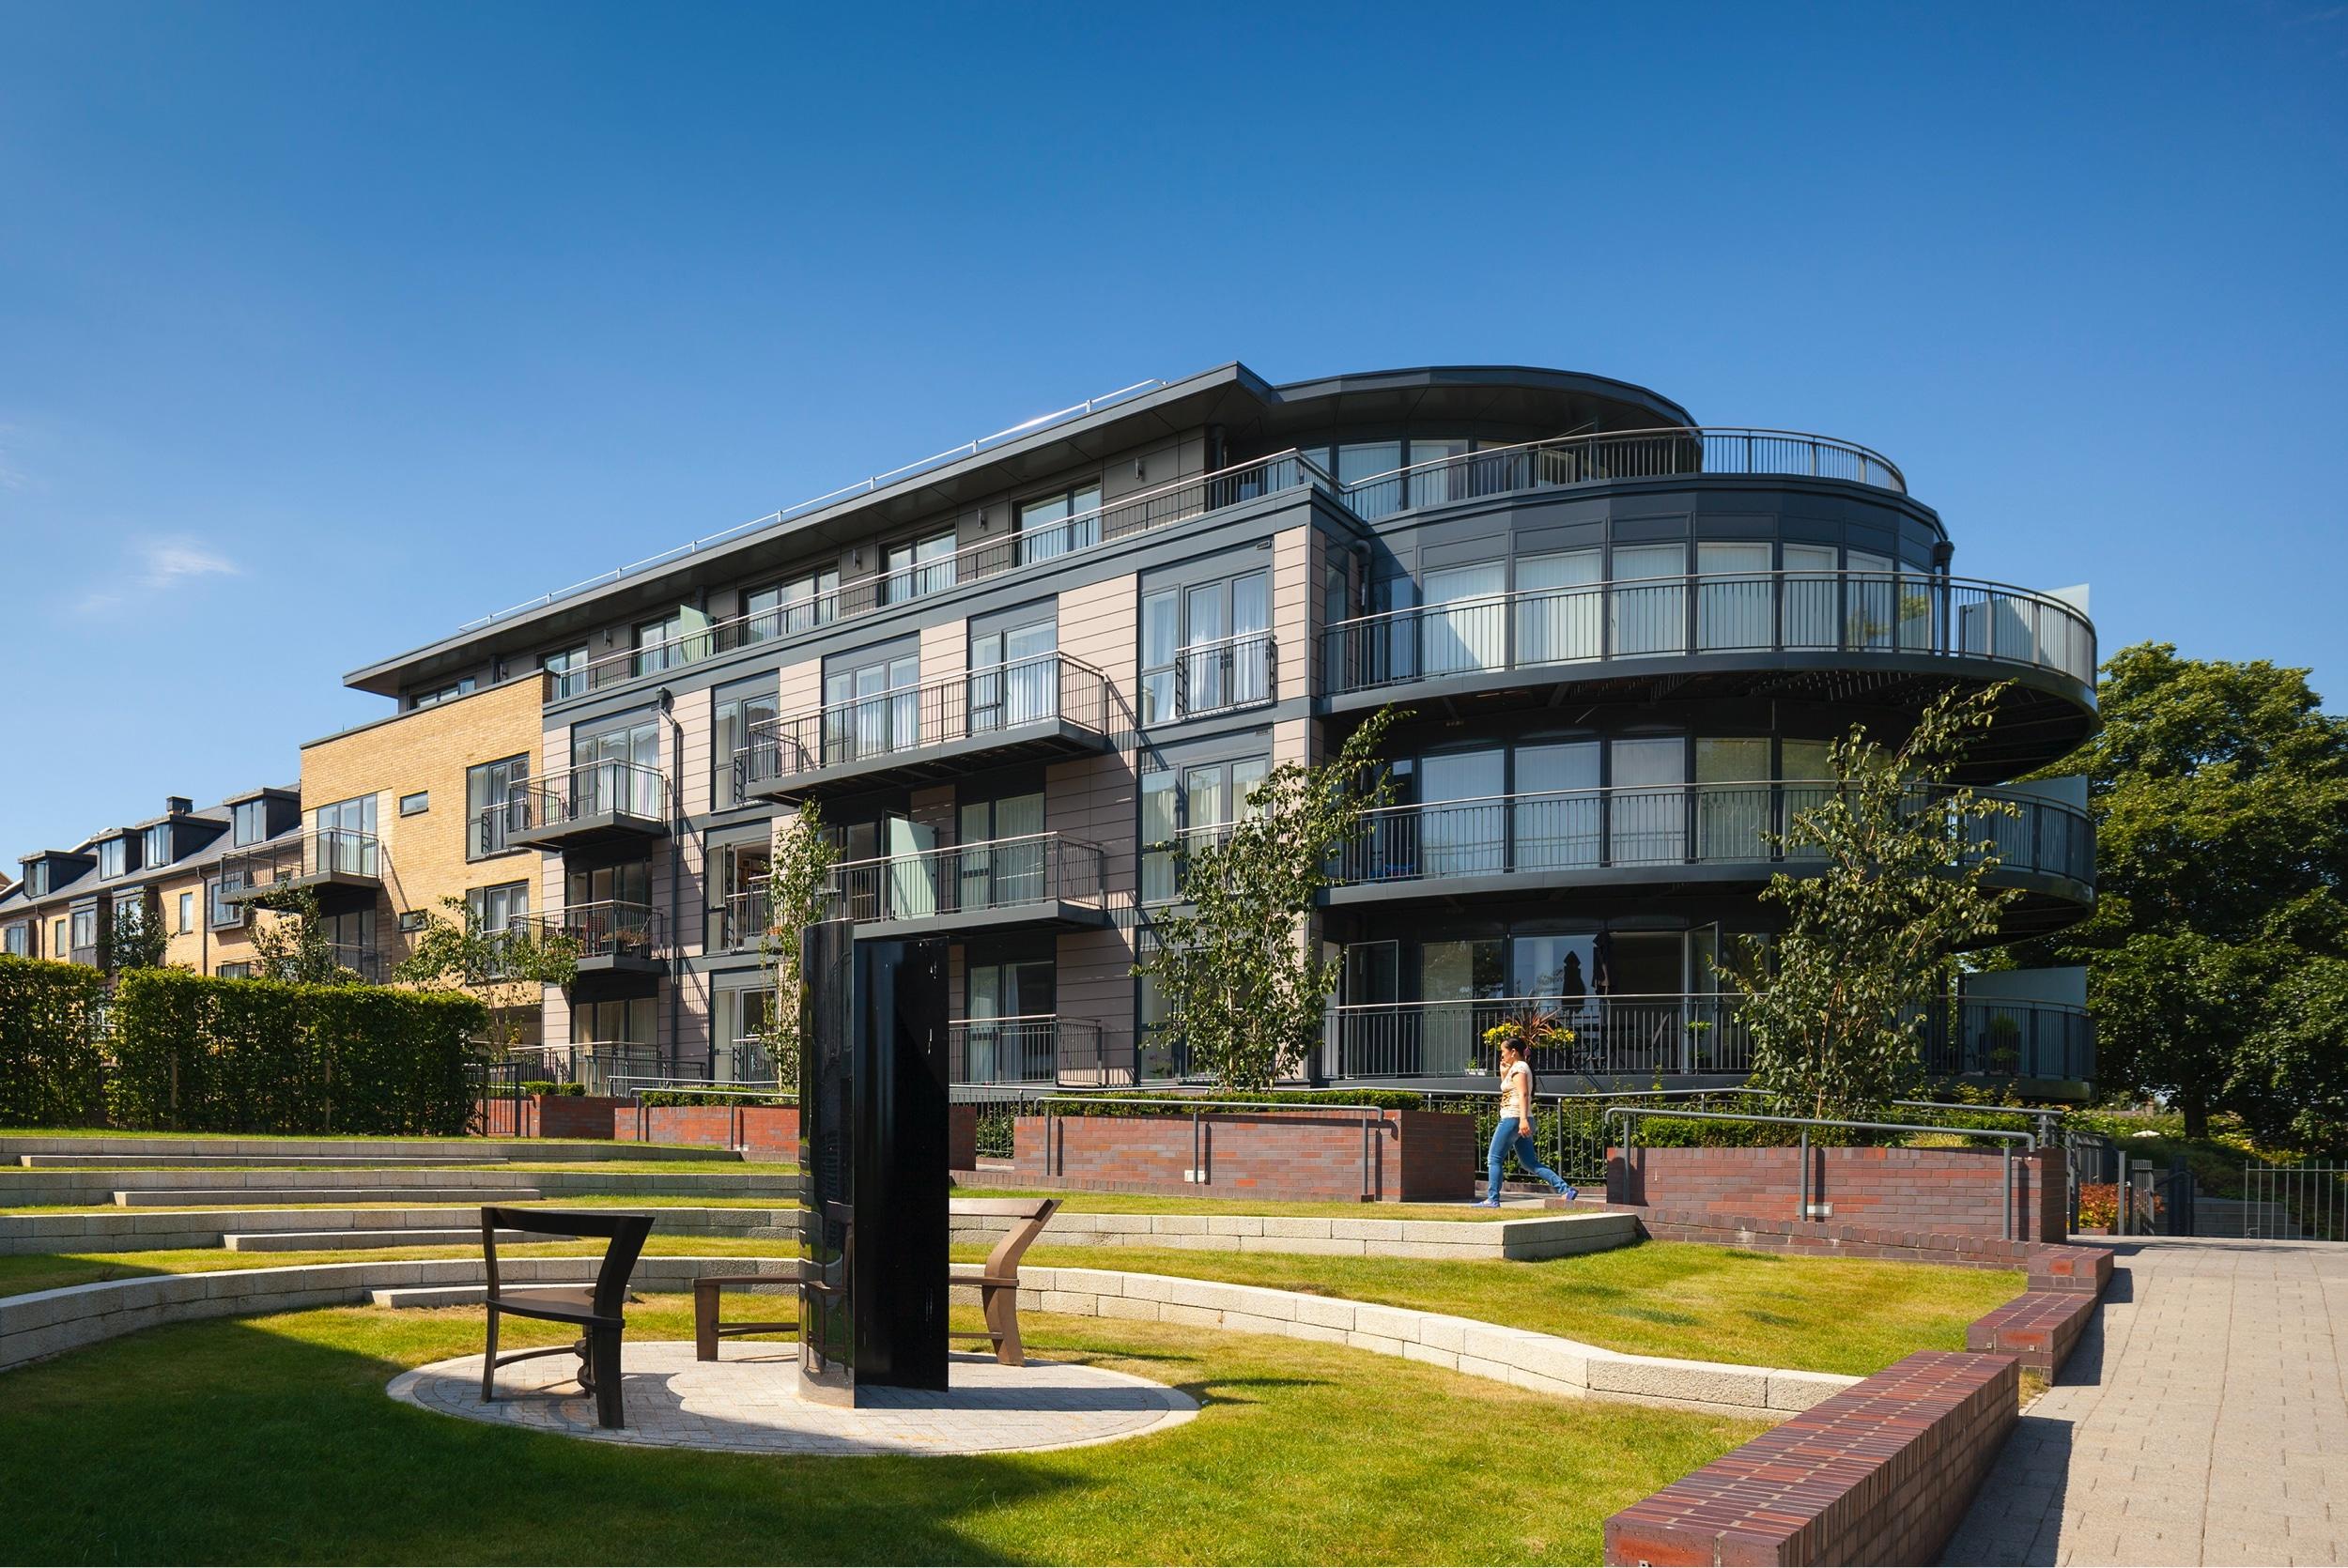 IDSystems installation for the Cambridge Riverside Berkley development